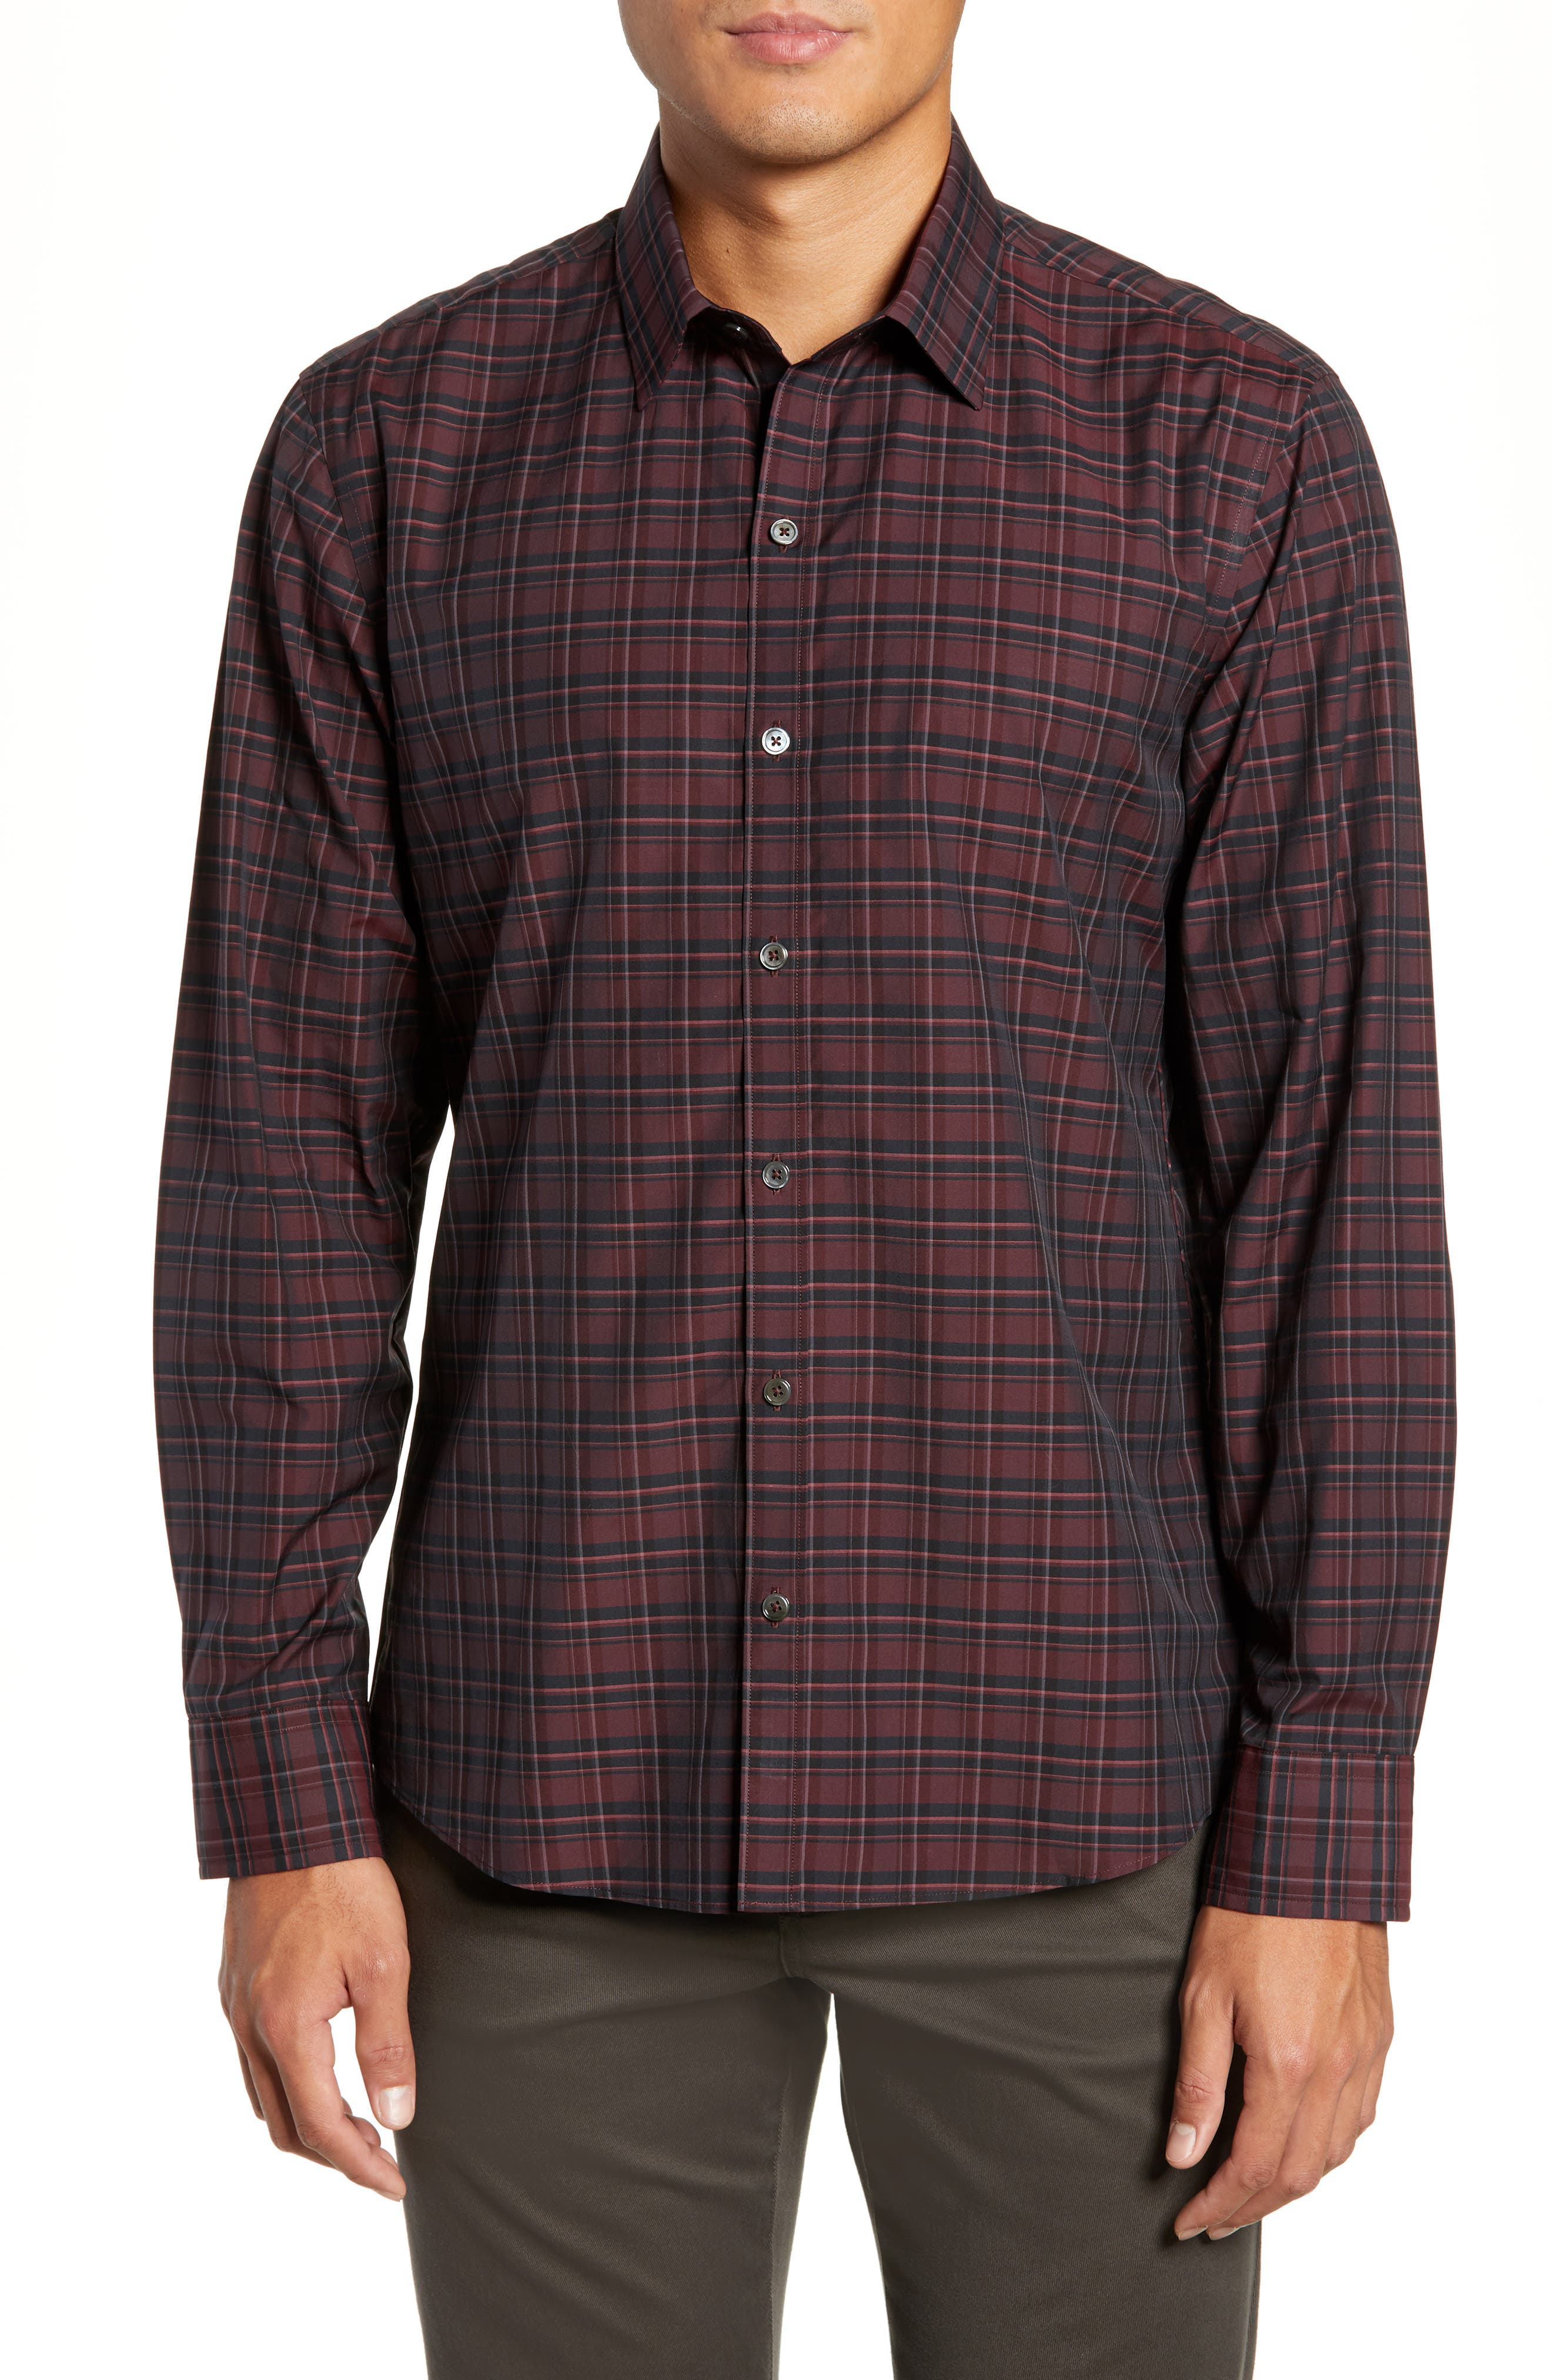 ZACHARY PRELL Sunny Regular Fit Sport Shirt, Main, color, RUBY